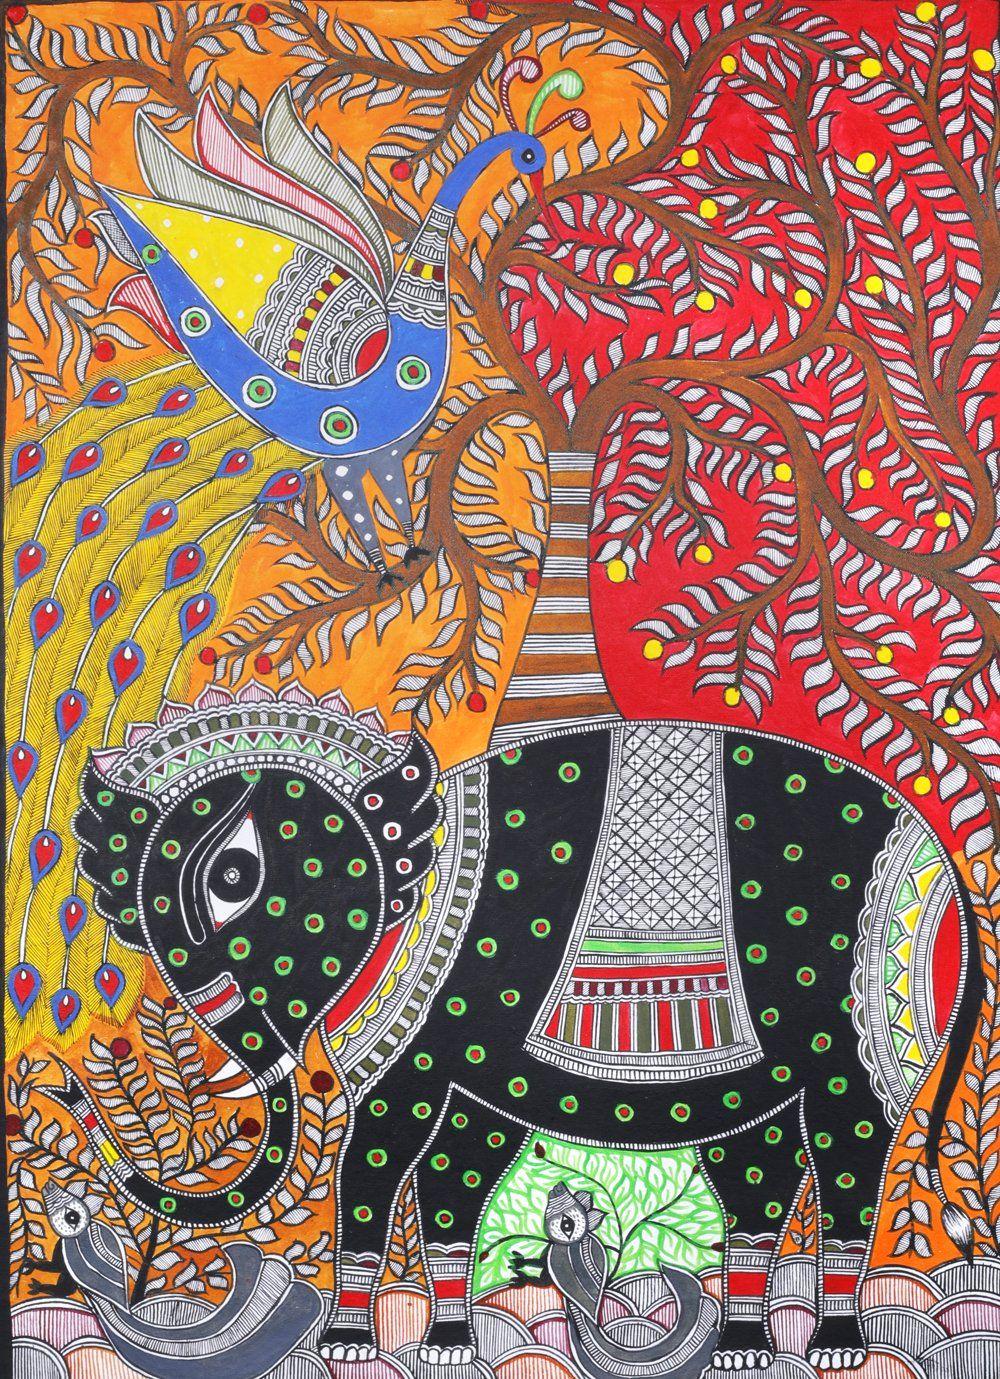 Elephant And Peacock With Tree Of Life Madhubani Painting Tribal Art Drawings Madhubani Art